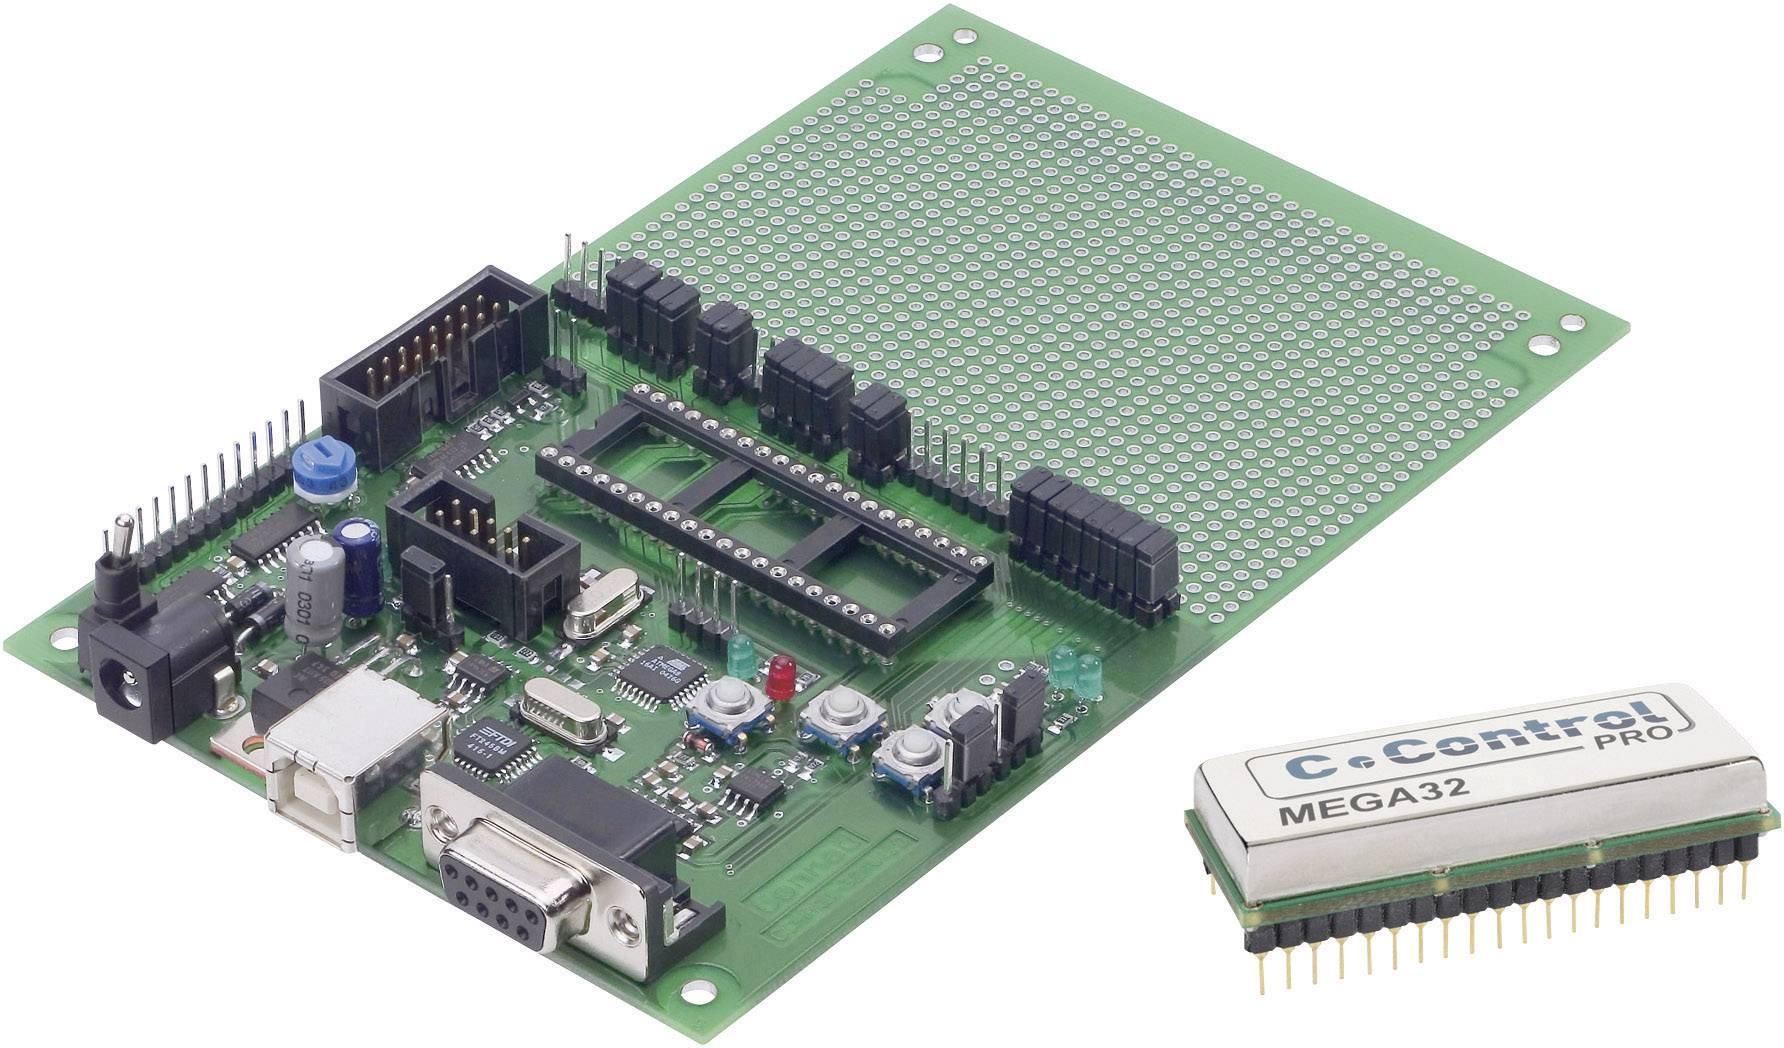 Štartovacia sada C-Control PRO Mega 32 Spar-Set 198583